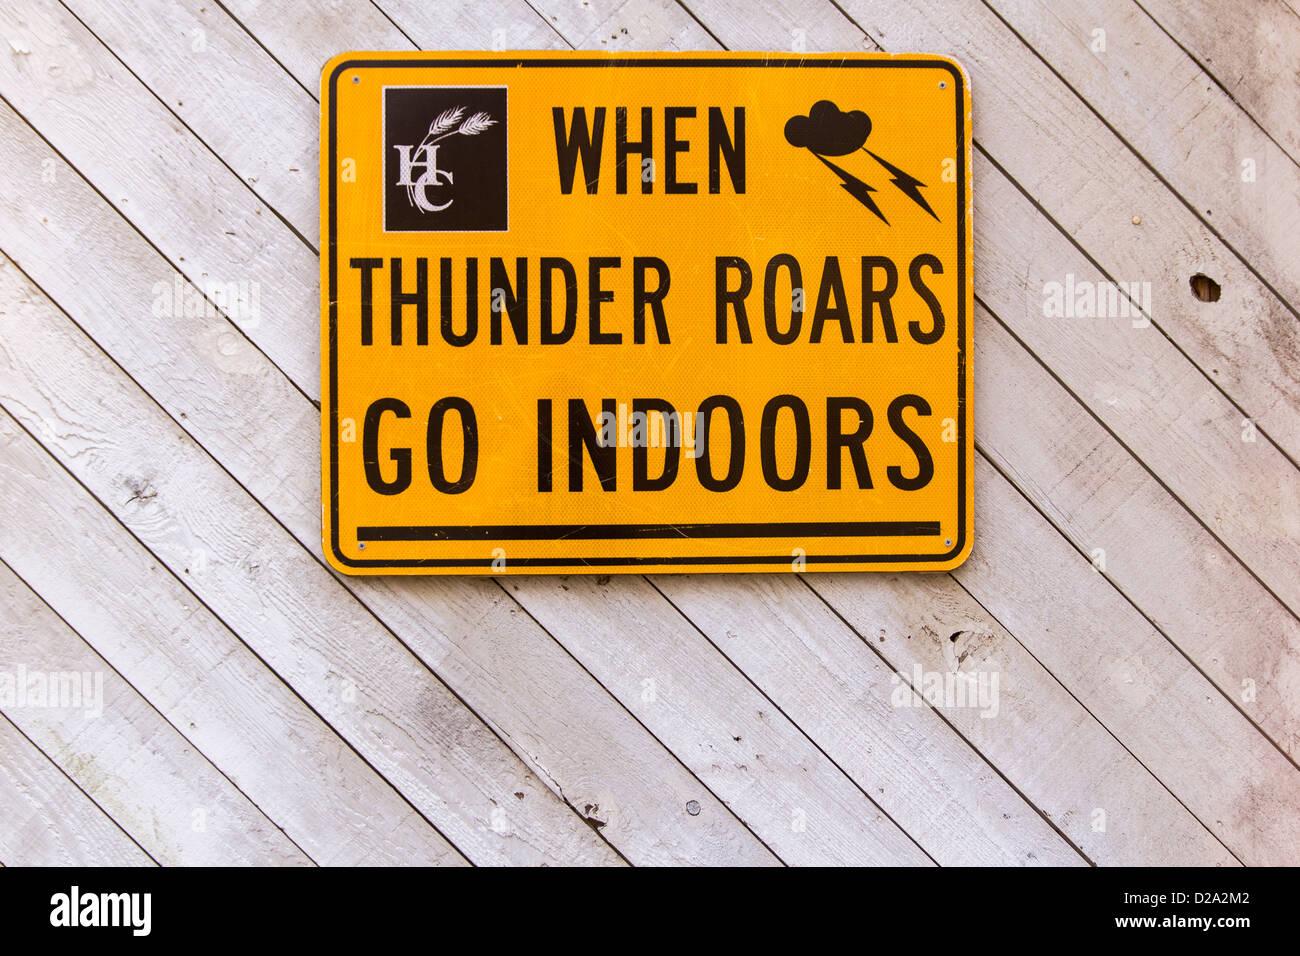 When Thunder Roars Go Indoors - Stock Image